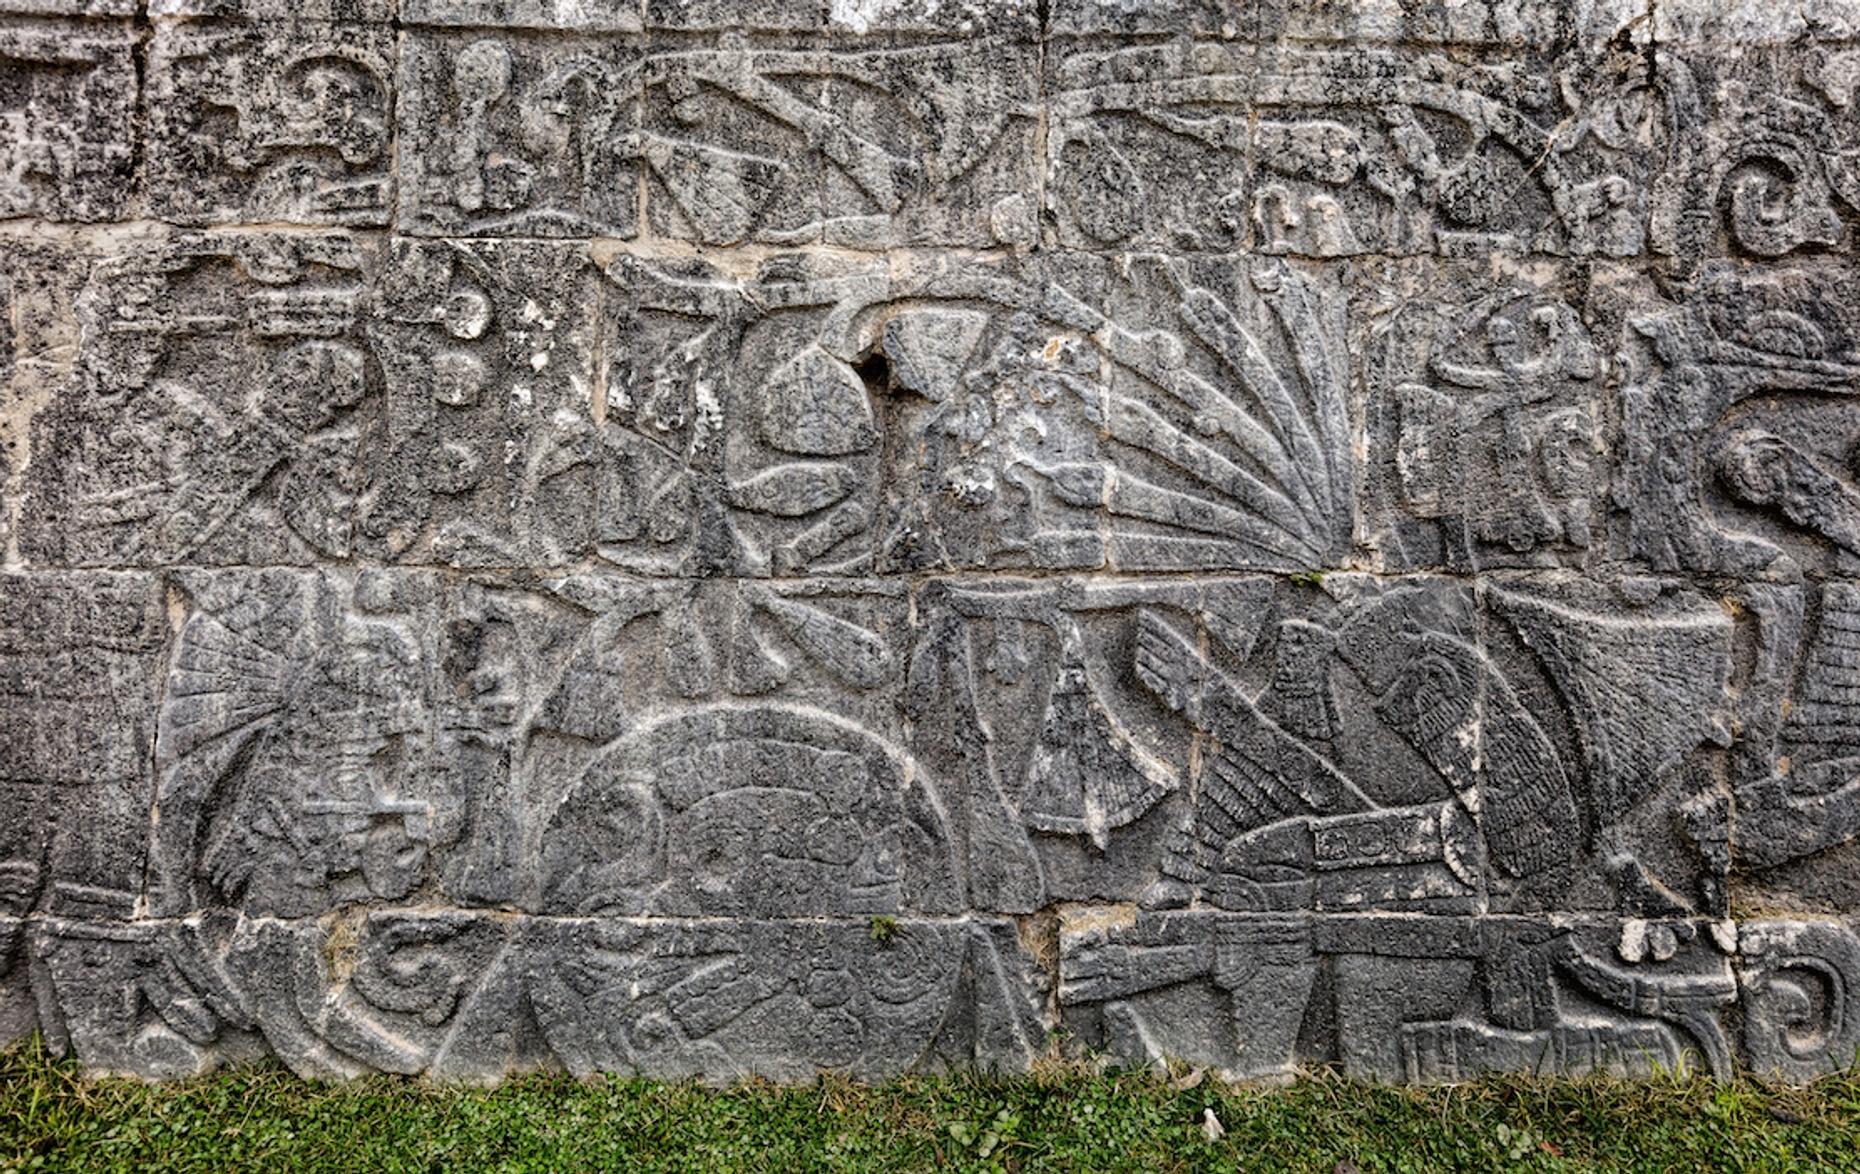 Self-Guided Tour of Chichen Itza